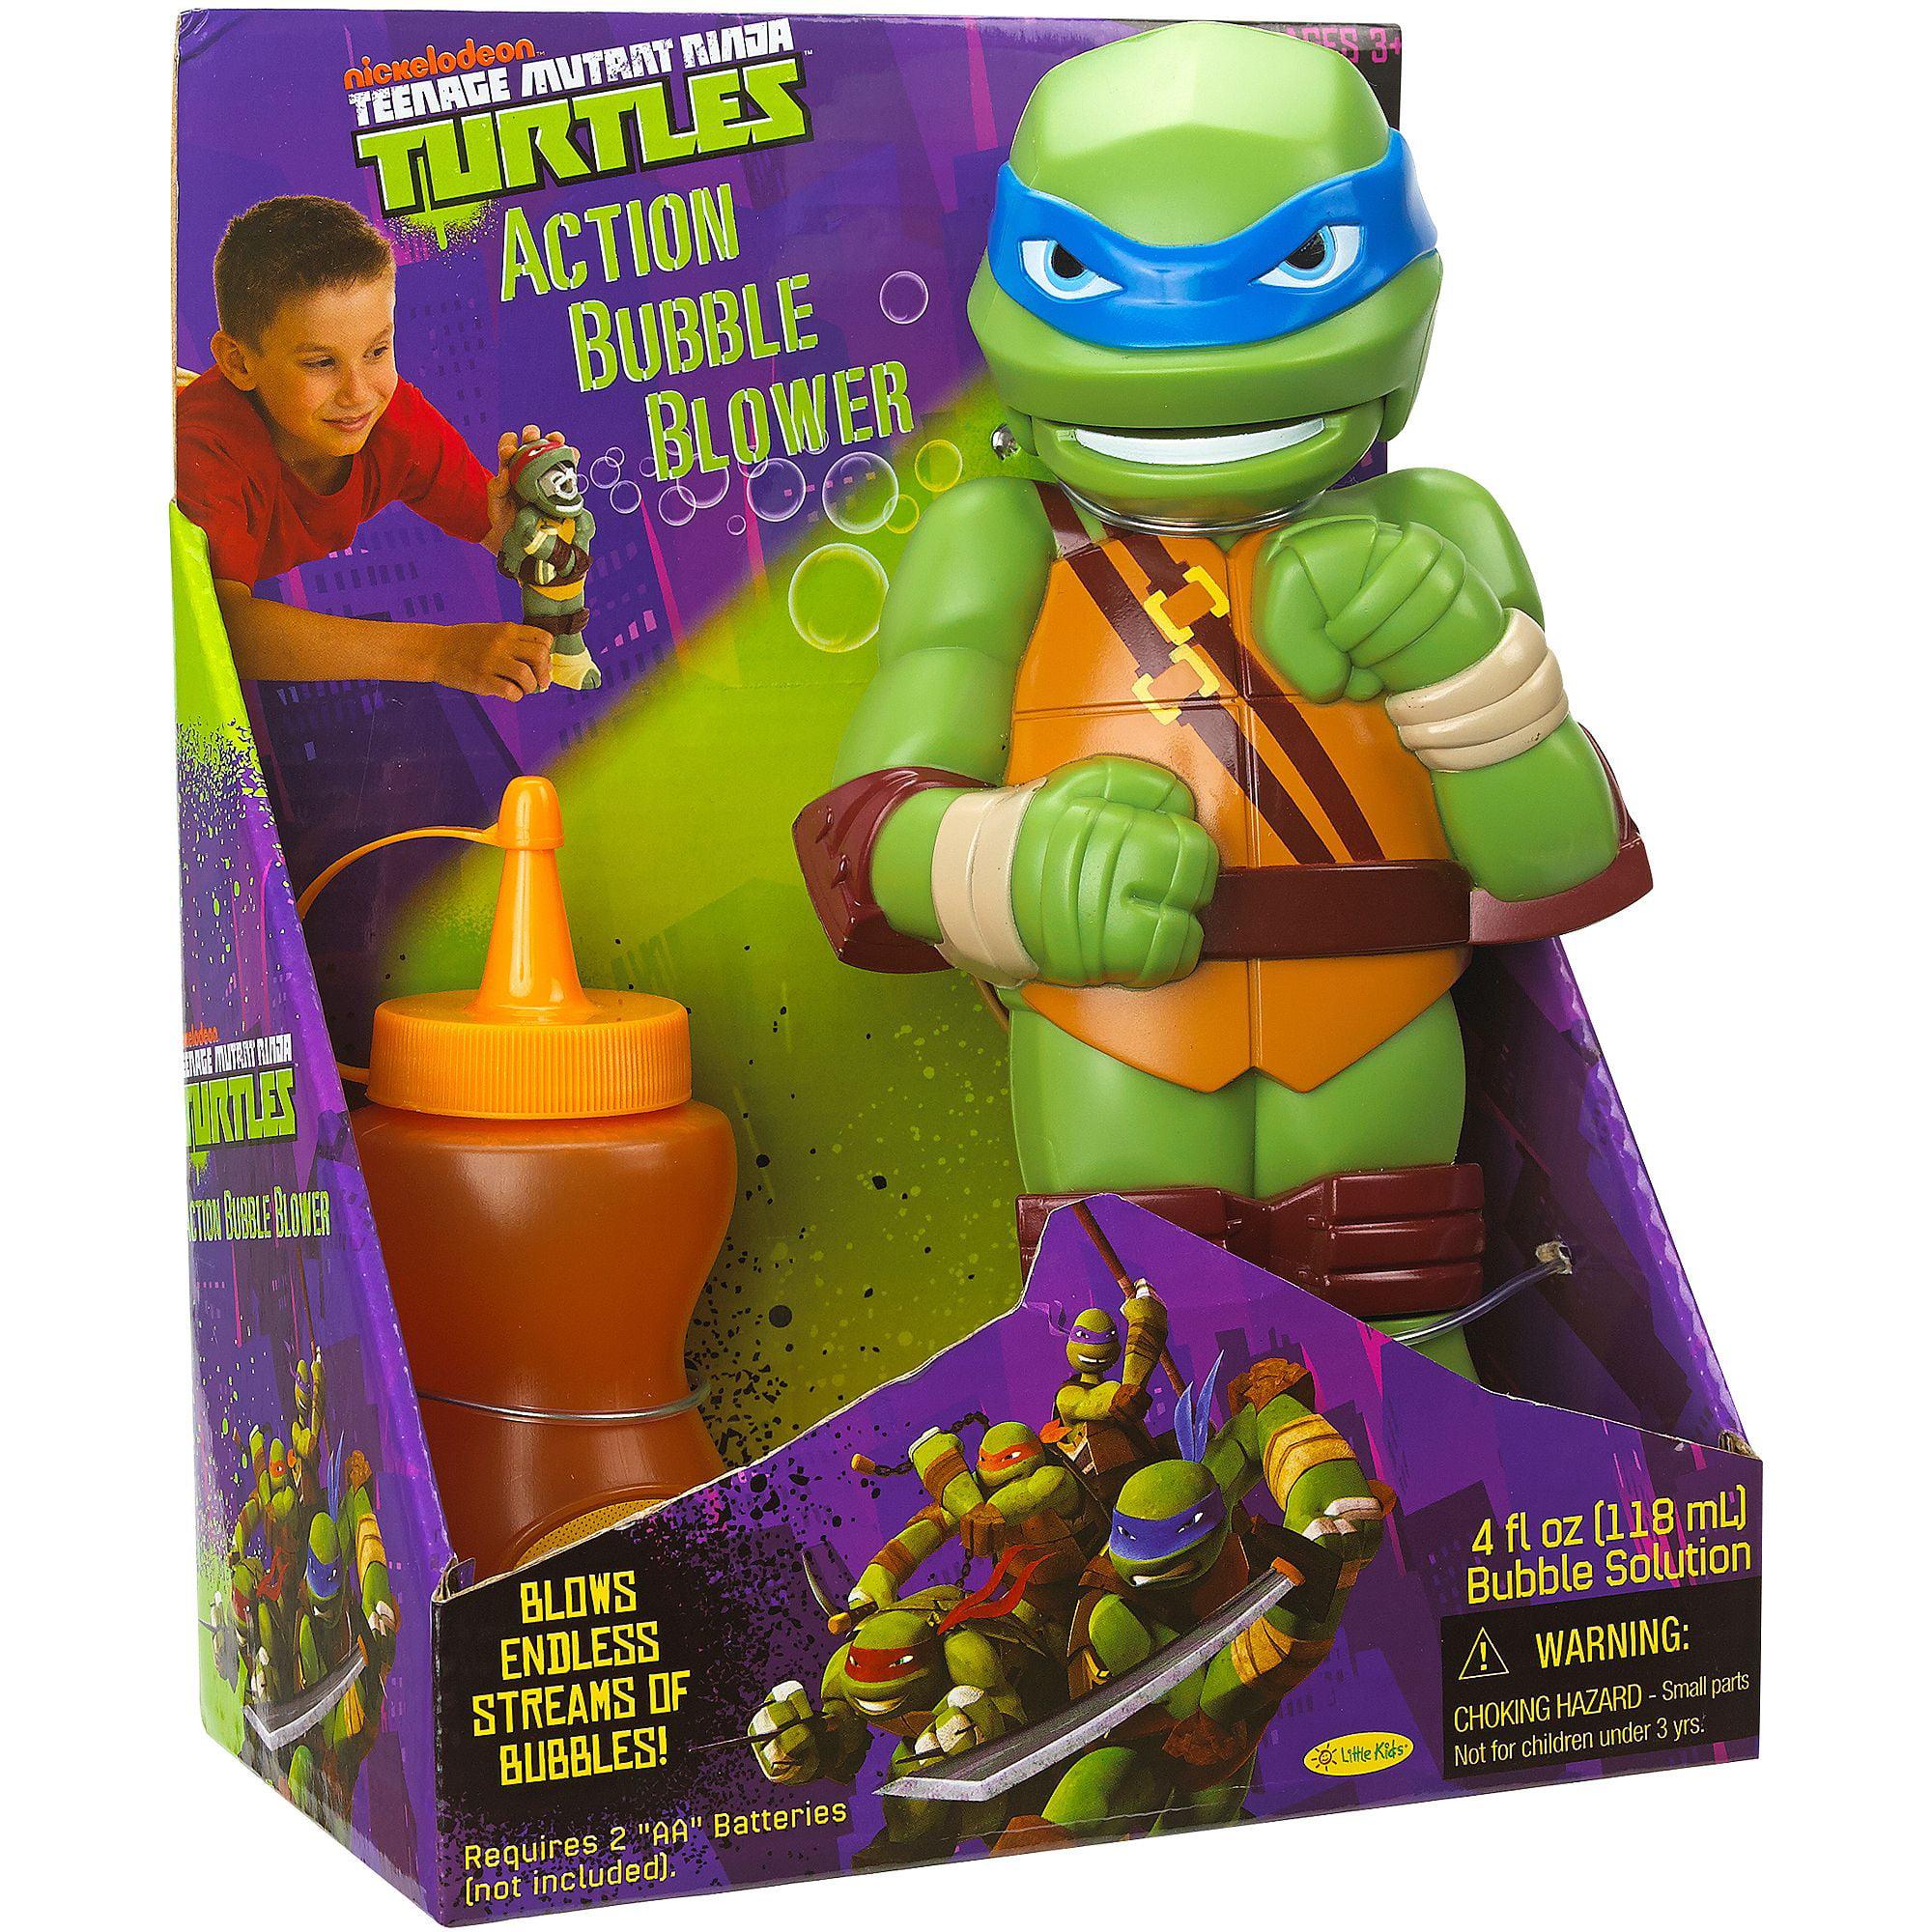 Little Kids Teenage Mutant Ninja Turtles Action Bubble Blower, Leonardo